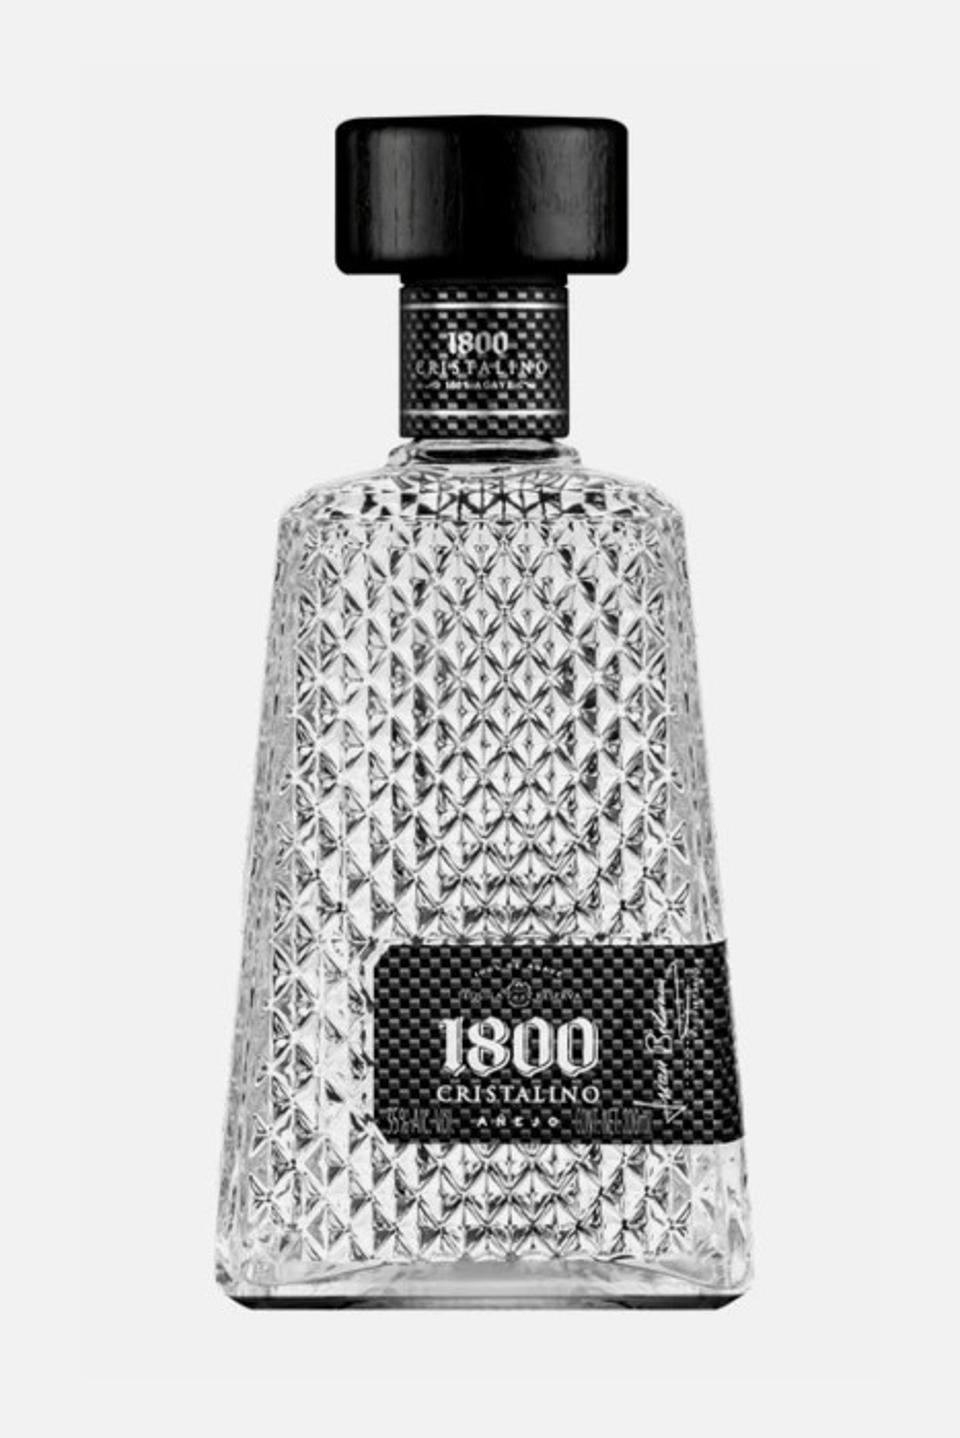 1800, Tequila Cristalino Añejo